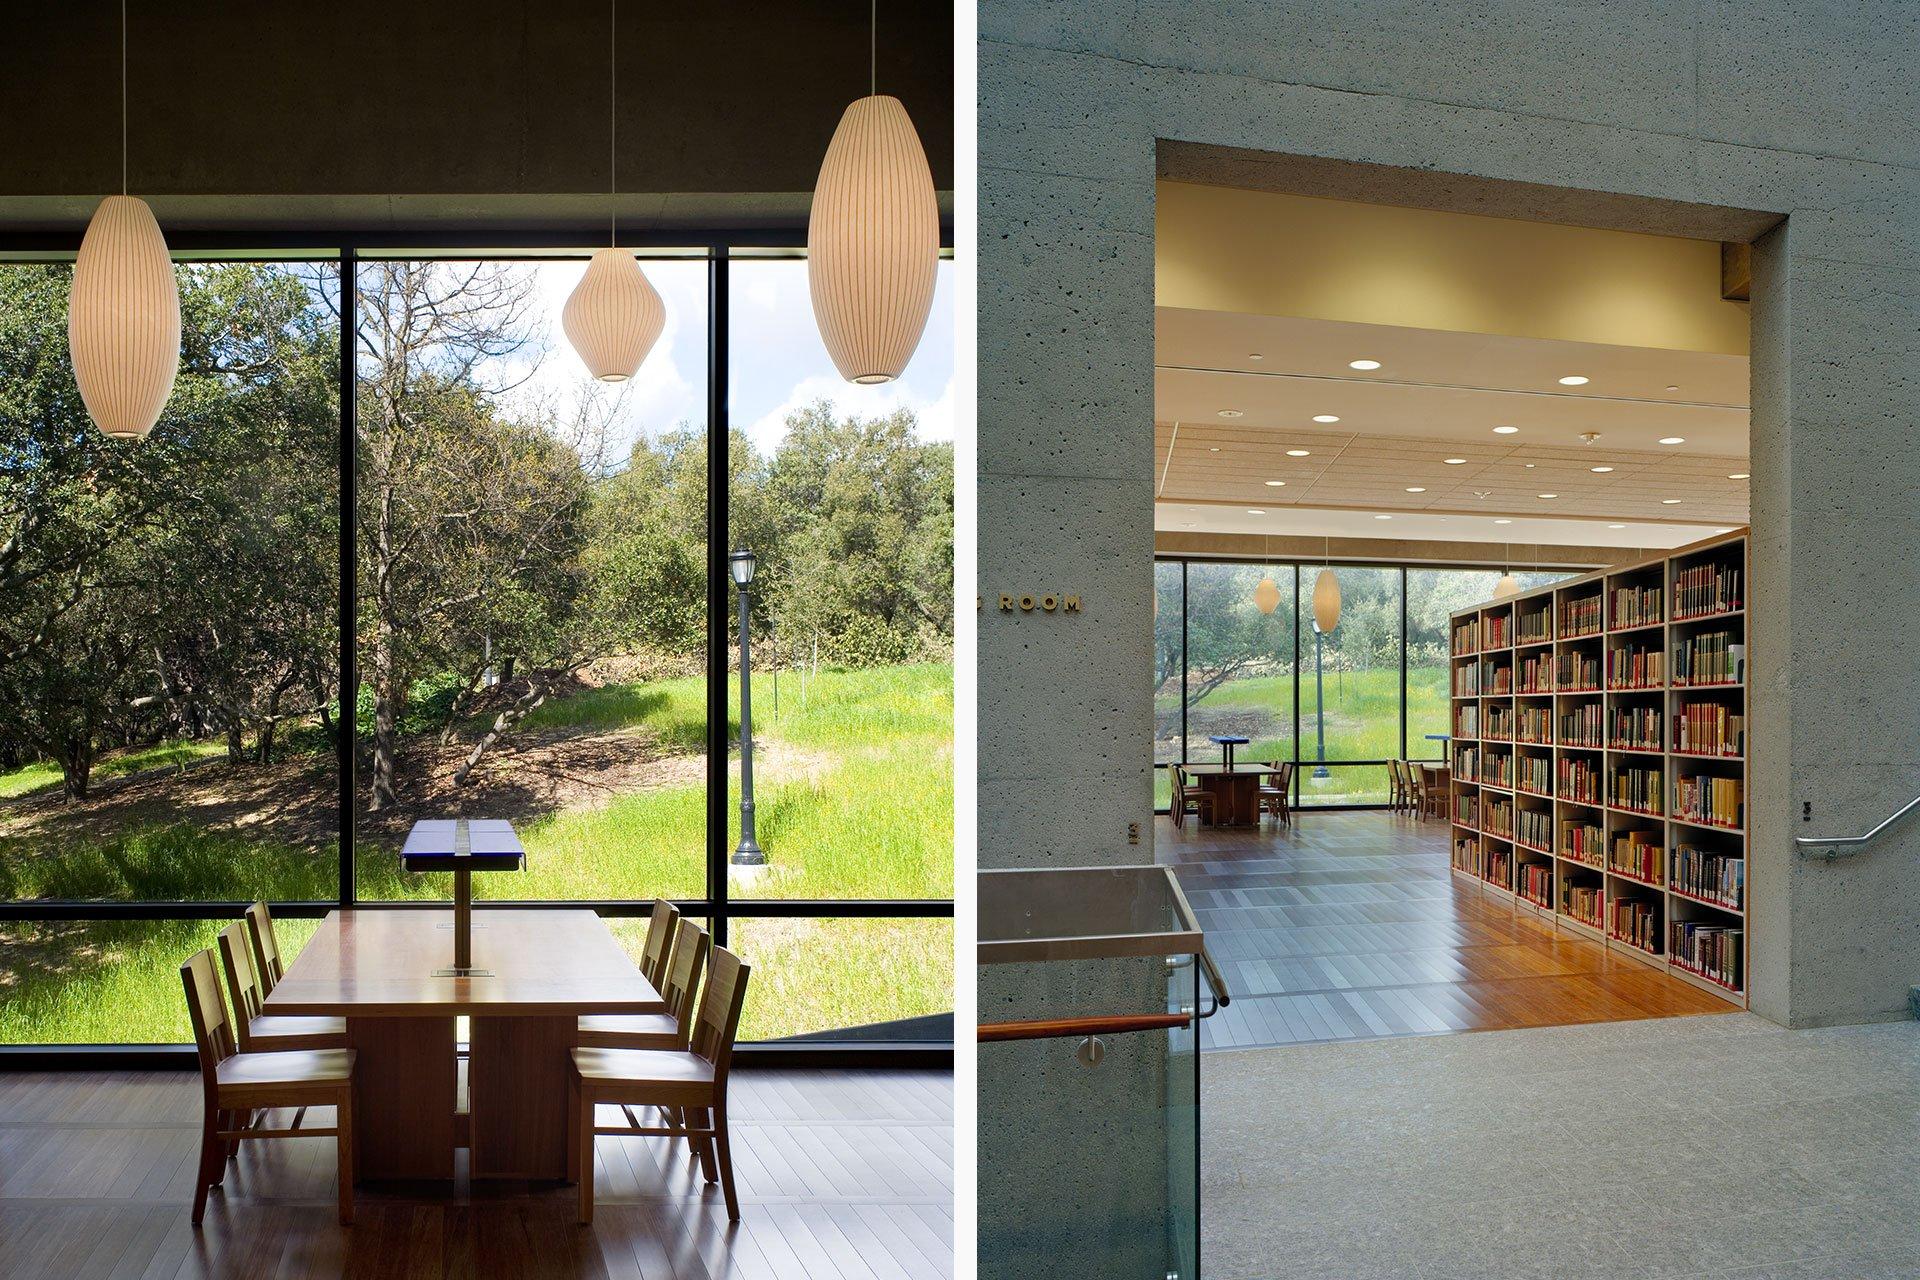 C.V. Starr East Asian Library interior OVI architectural lighting design